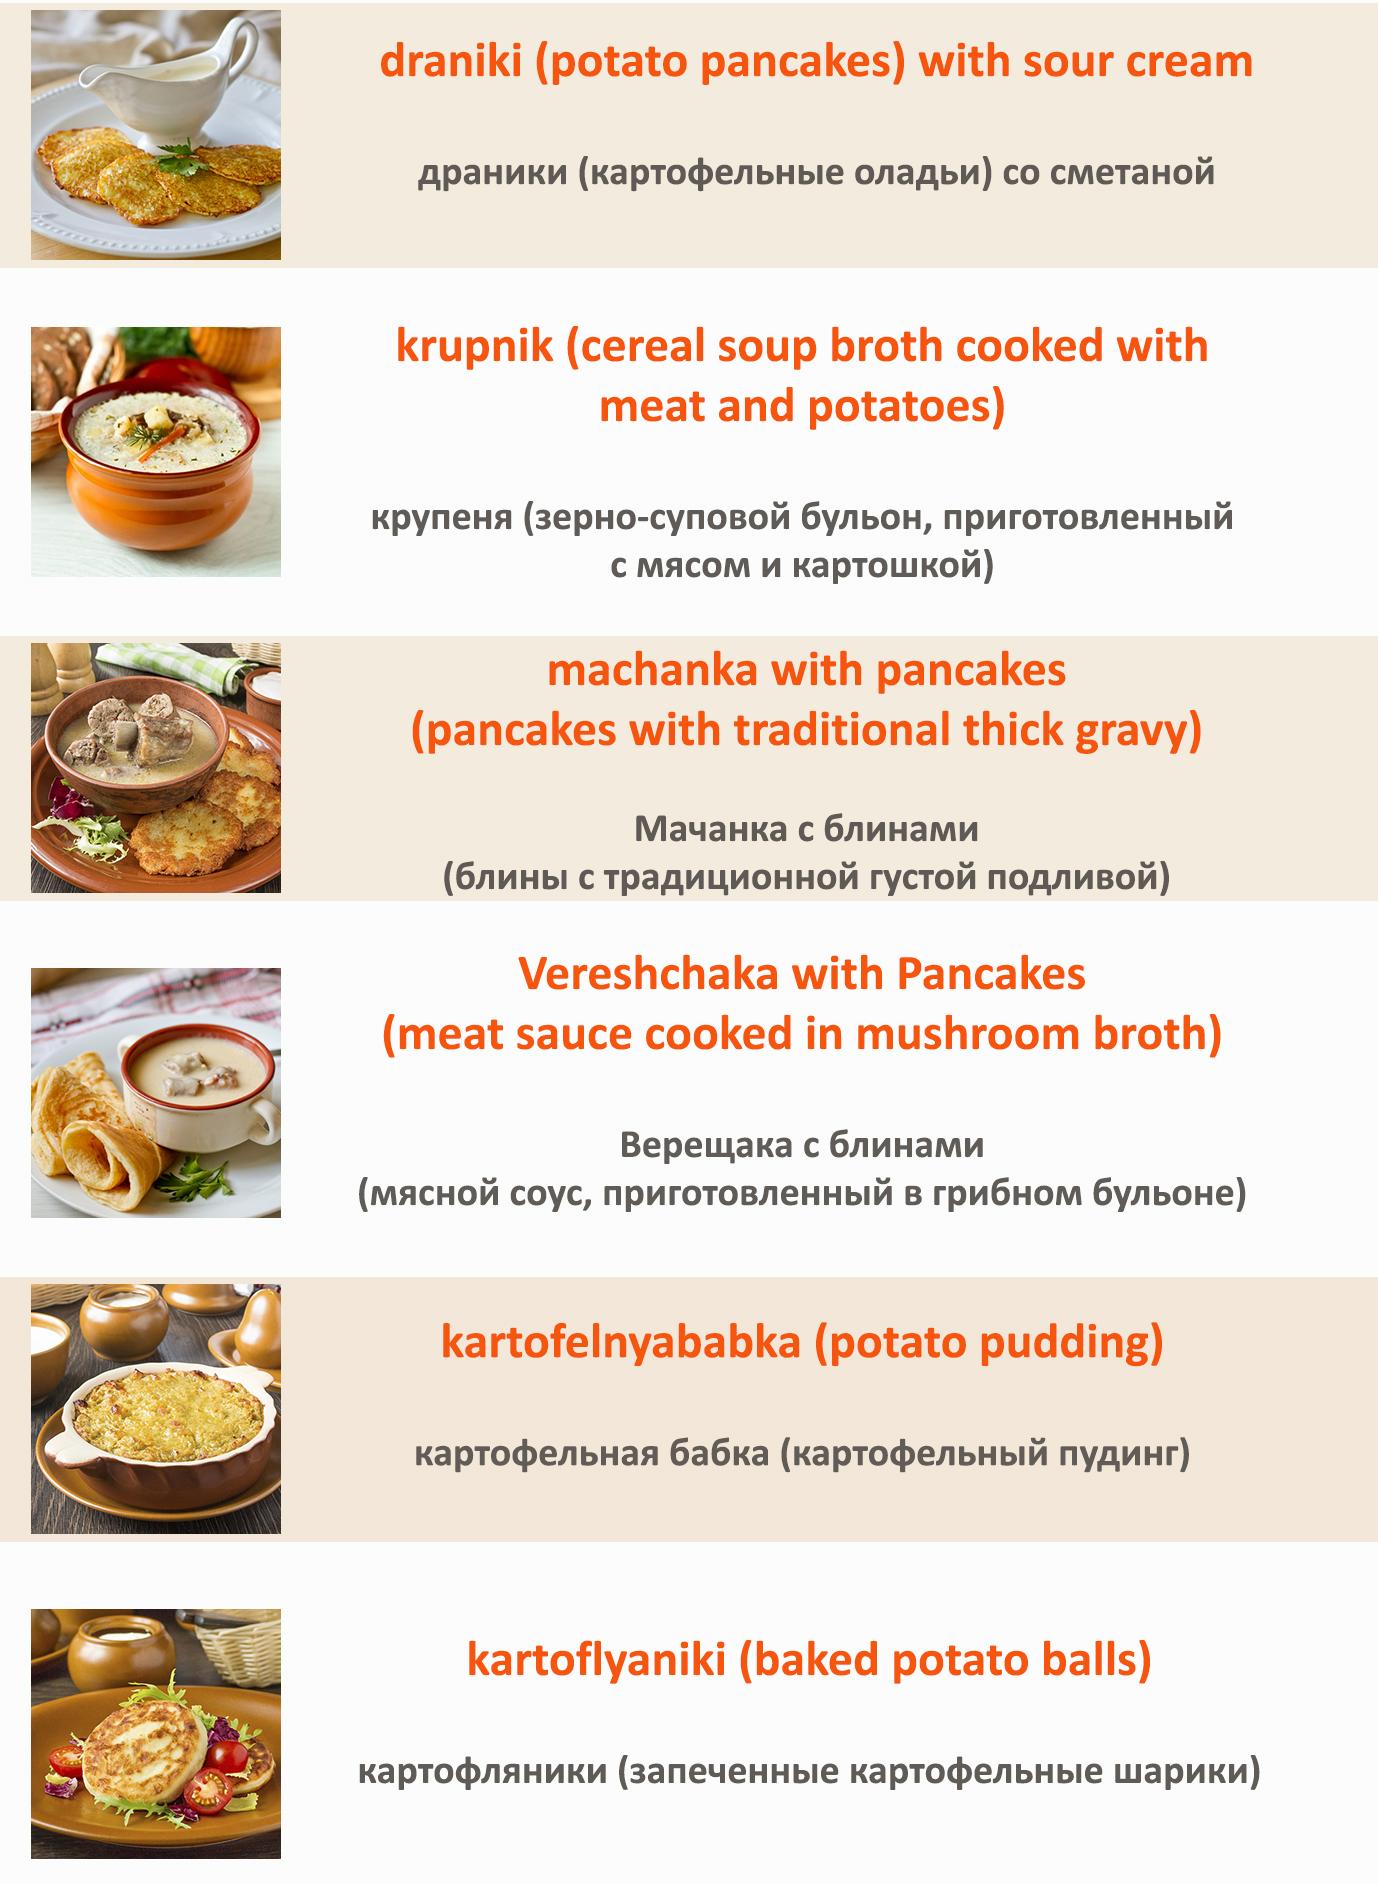 список блюд2